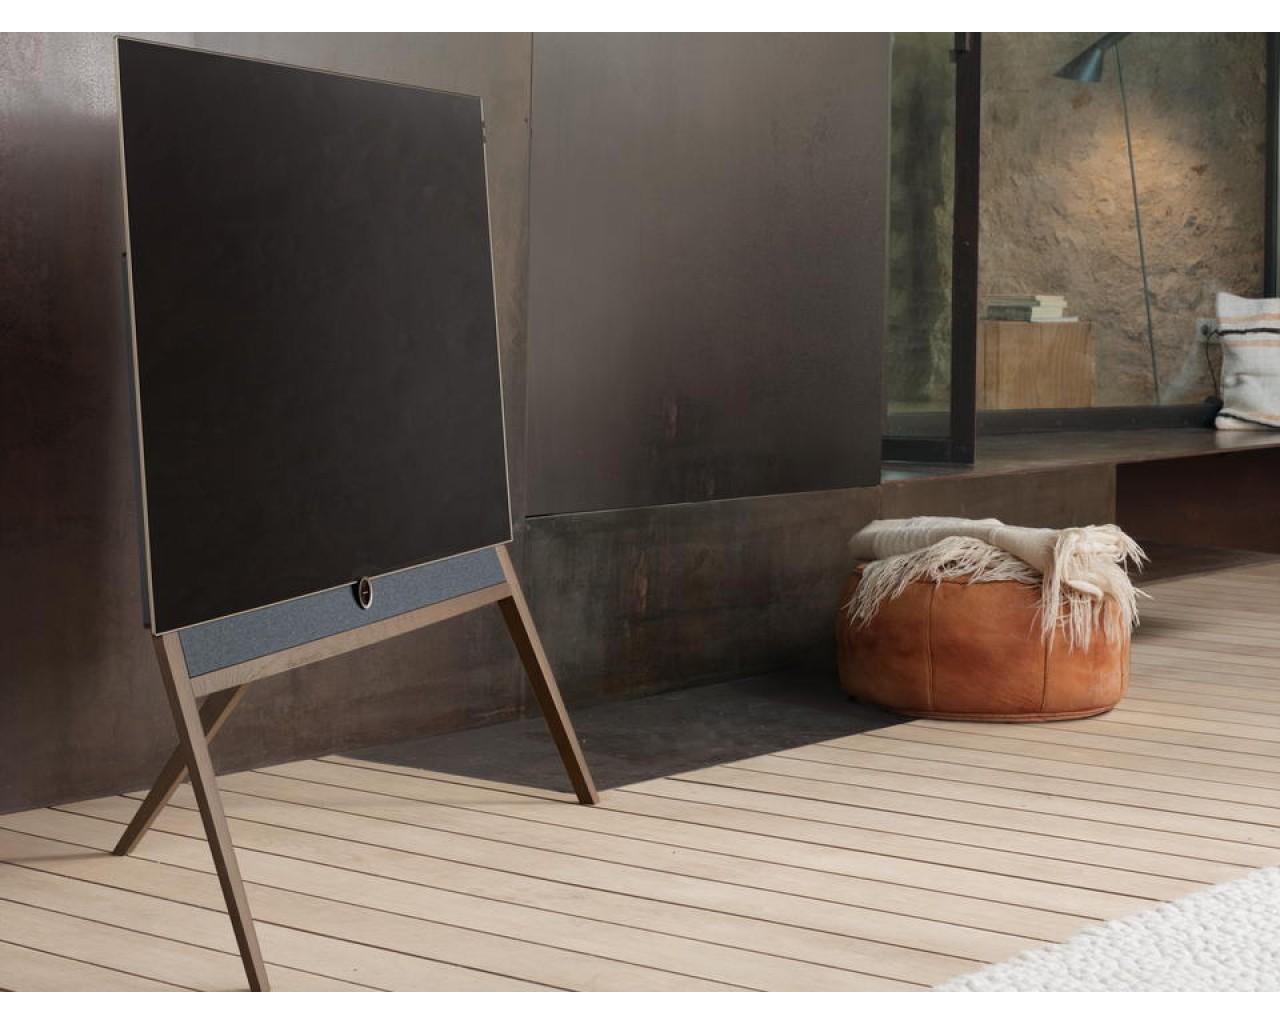 LOEWE Bild 5.65 OLED piano black